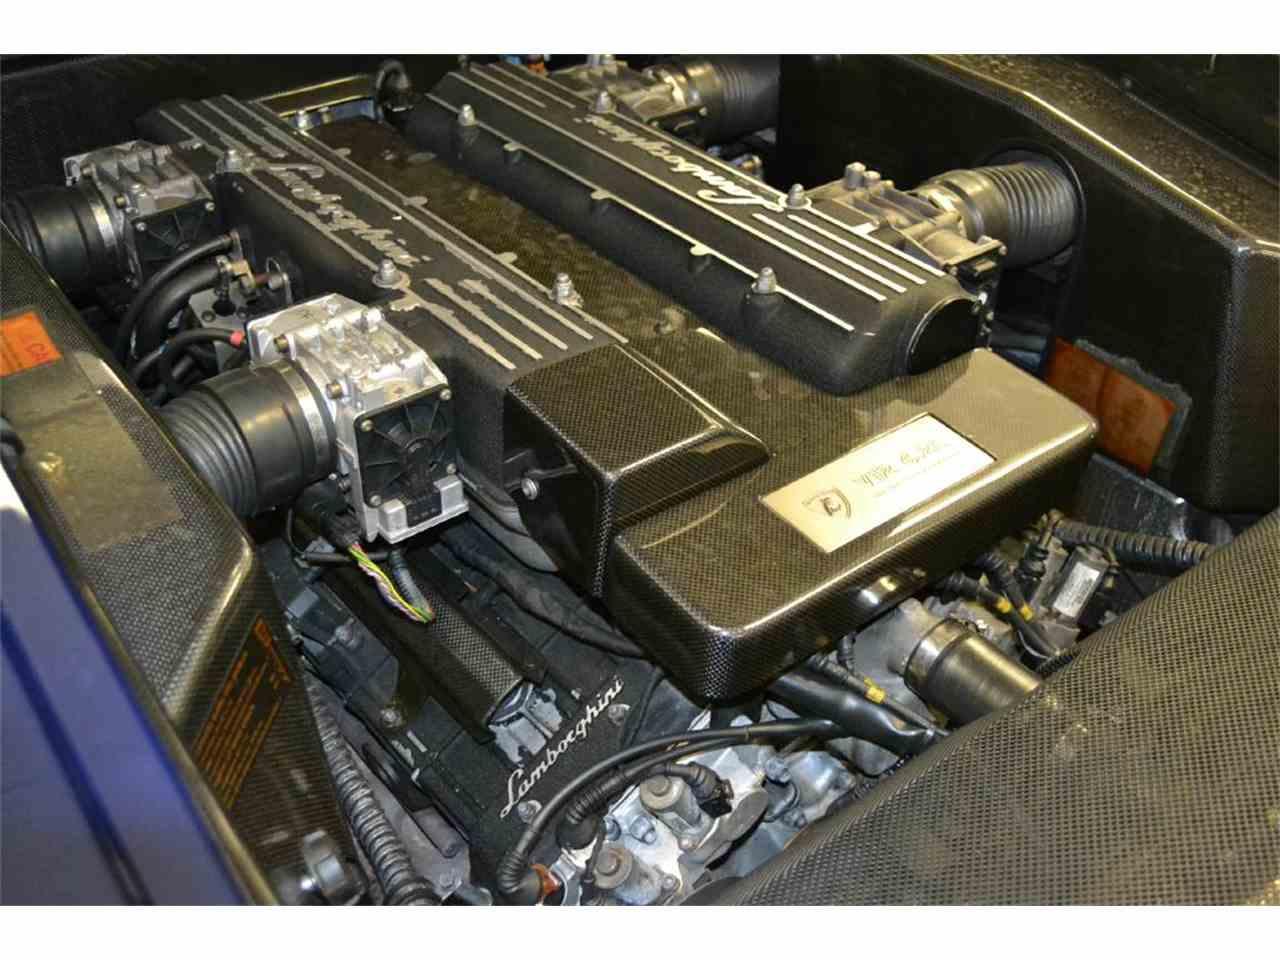 Large Picture of 2004 Lamborghini Murcielago located in California - $110,000.00 Offered by Fortunauto 13 LLC - LVJ1